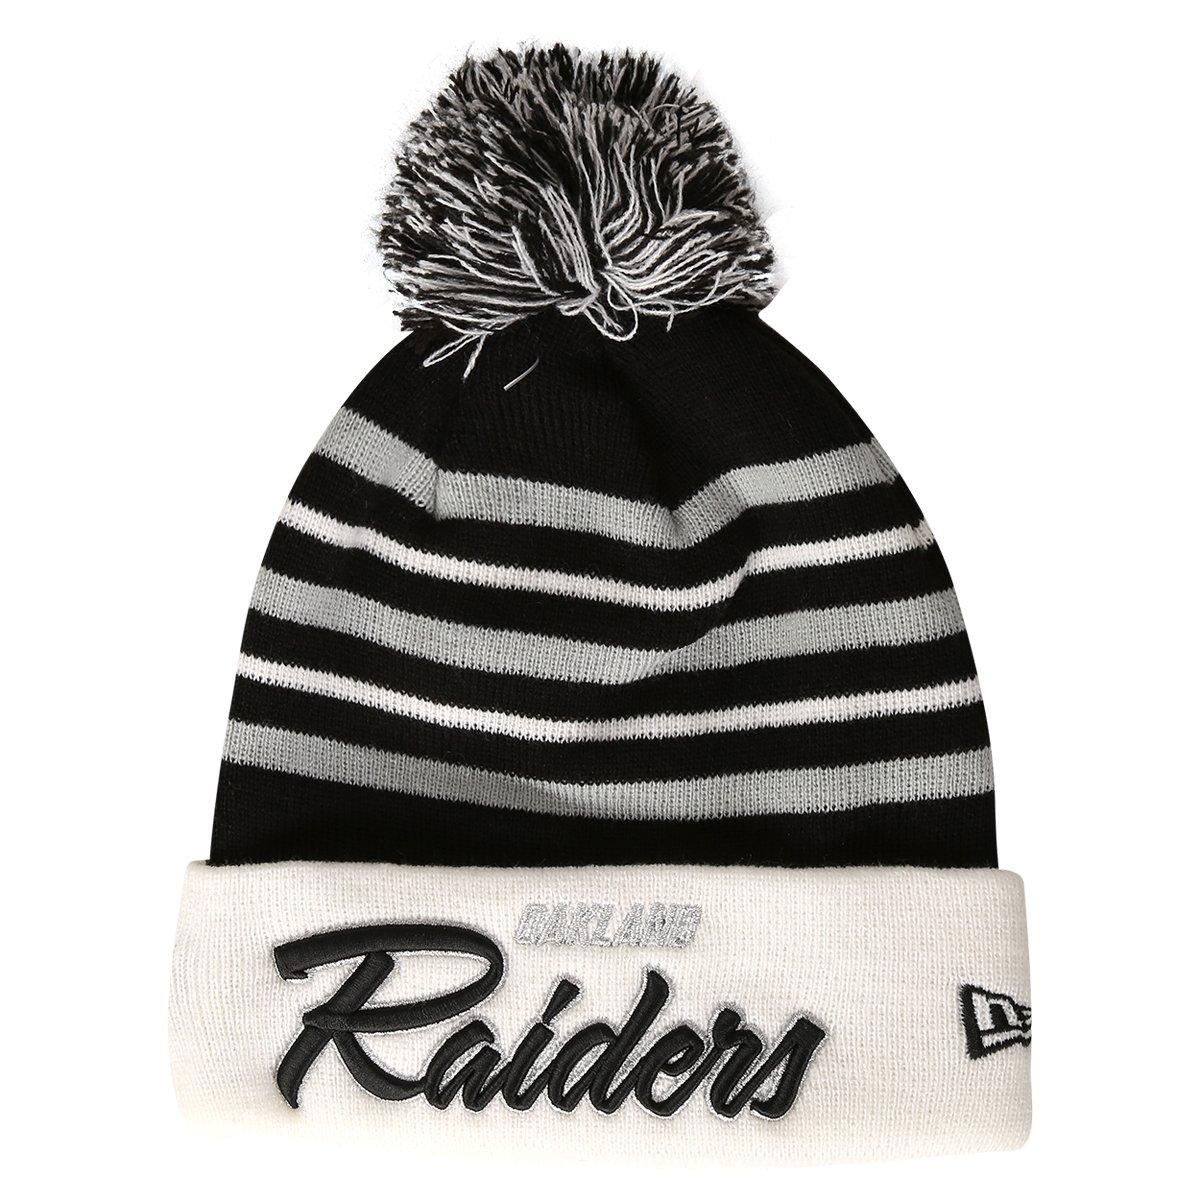 2c70dbb2bf3cb Gorro New Era NFL Pom Snow Stripe Oakland Raiders - Compre Agora ...